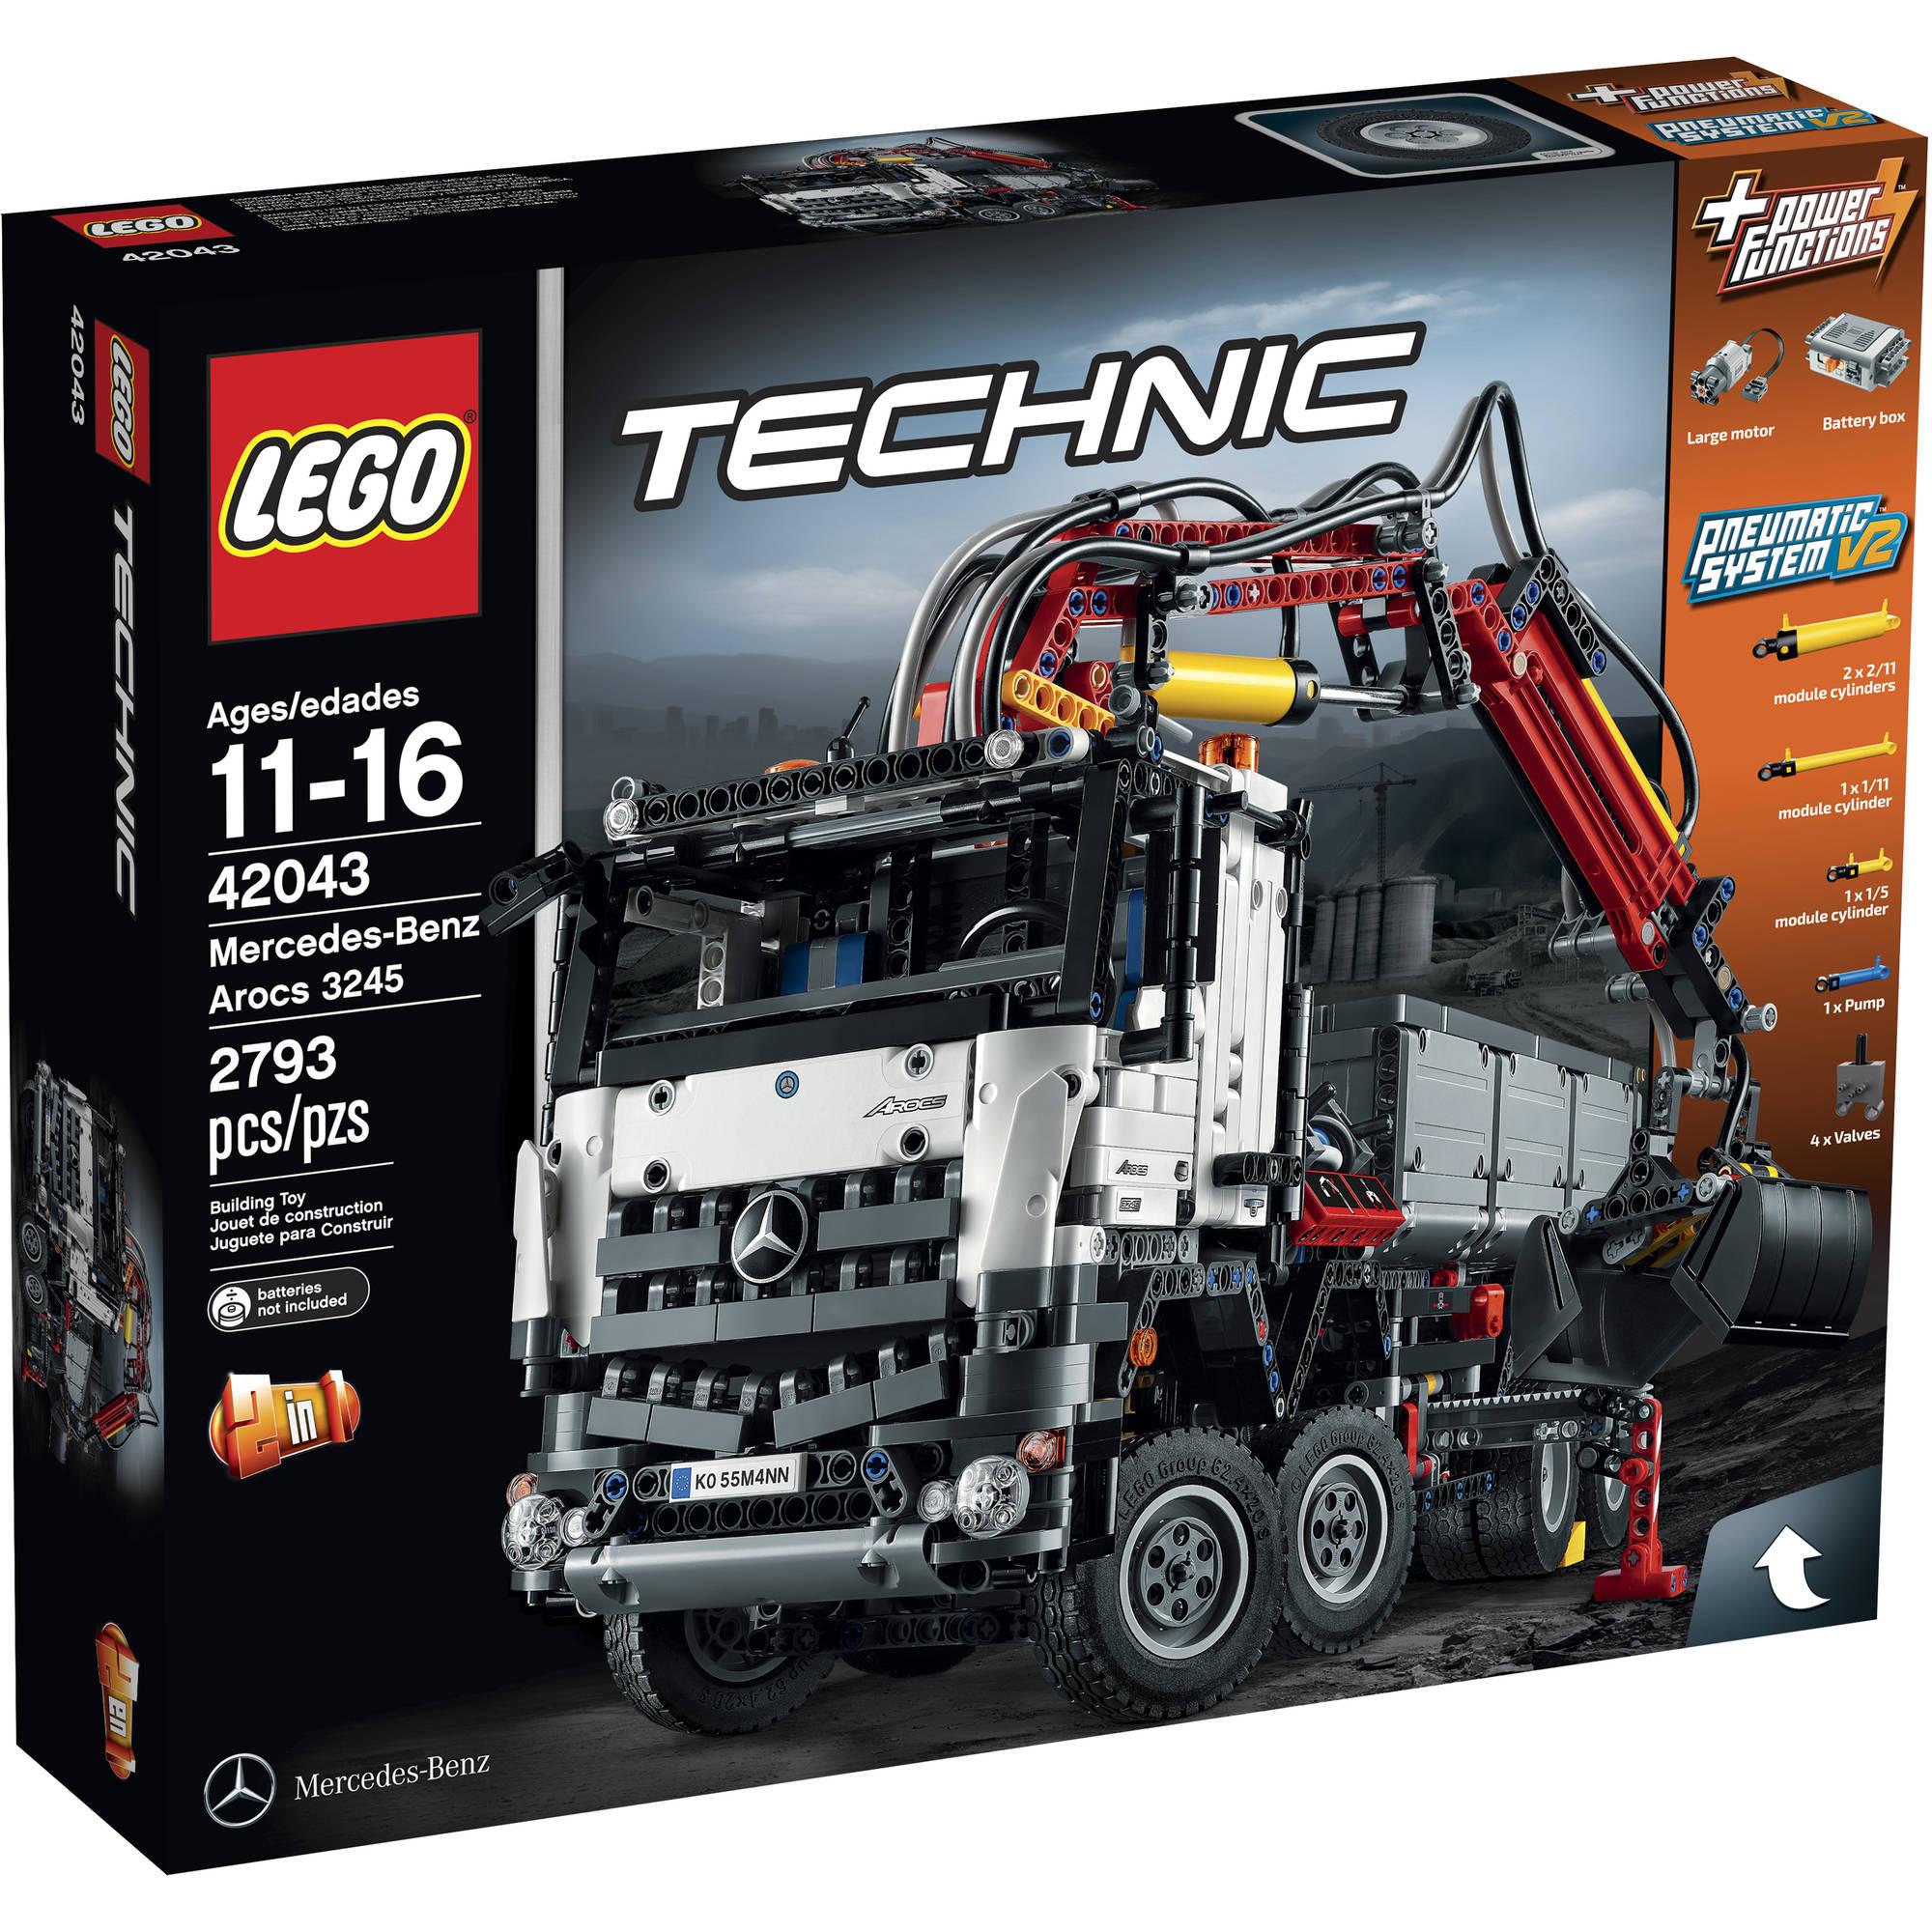 LEGO Technic Mercedes-Benz Arocs 3245 42043 42043